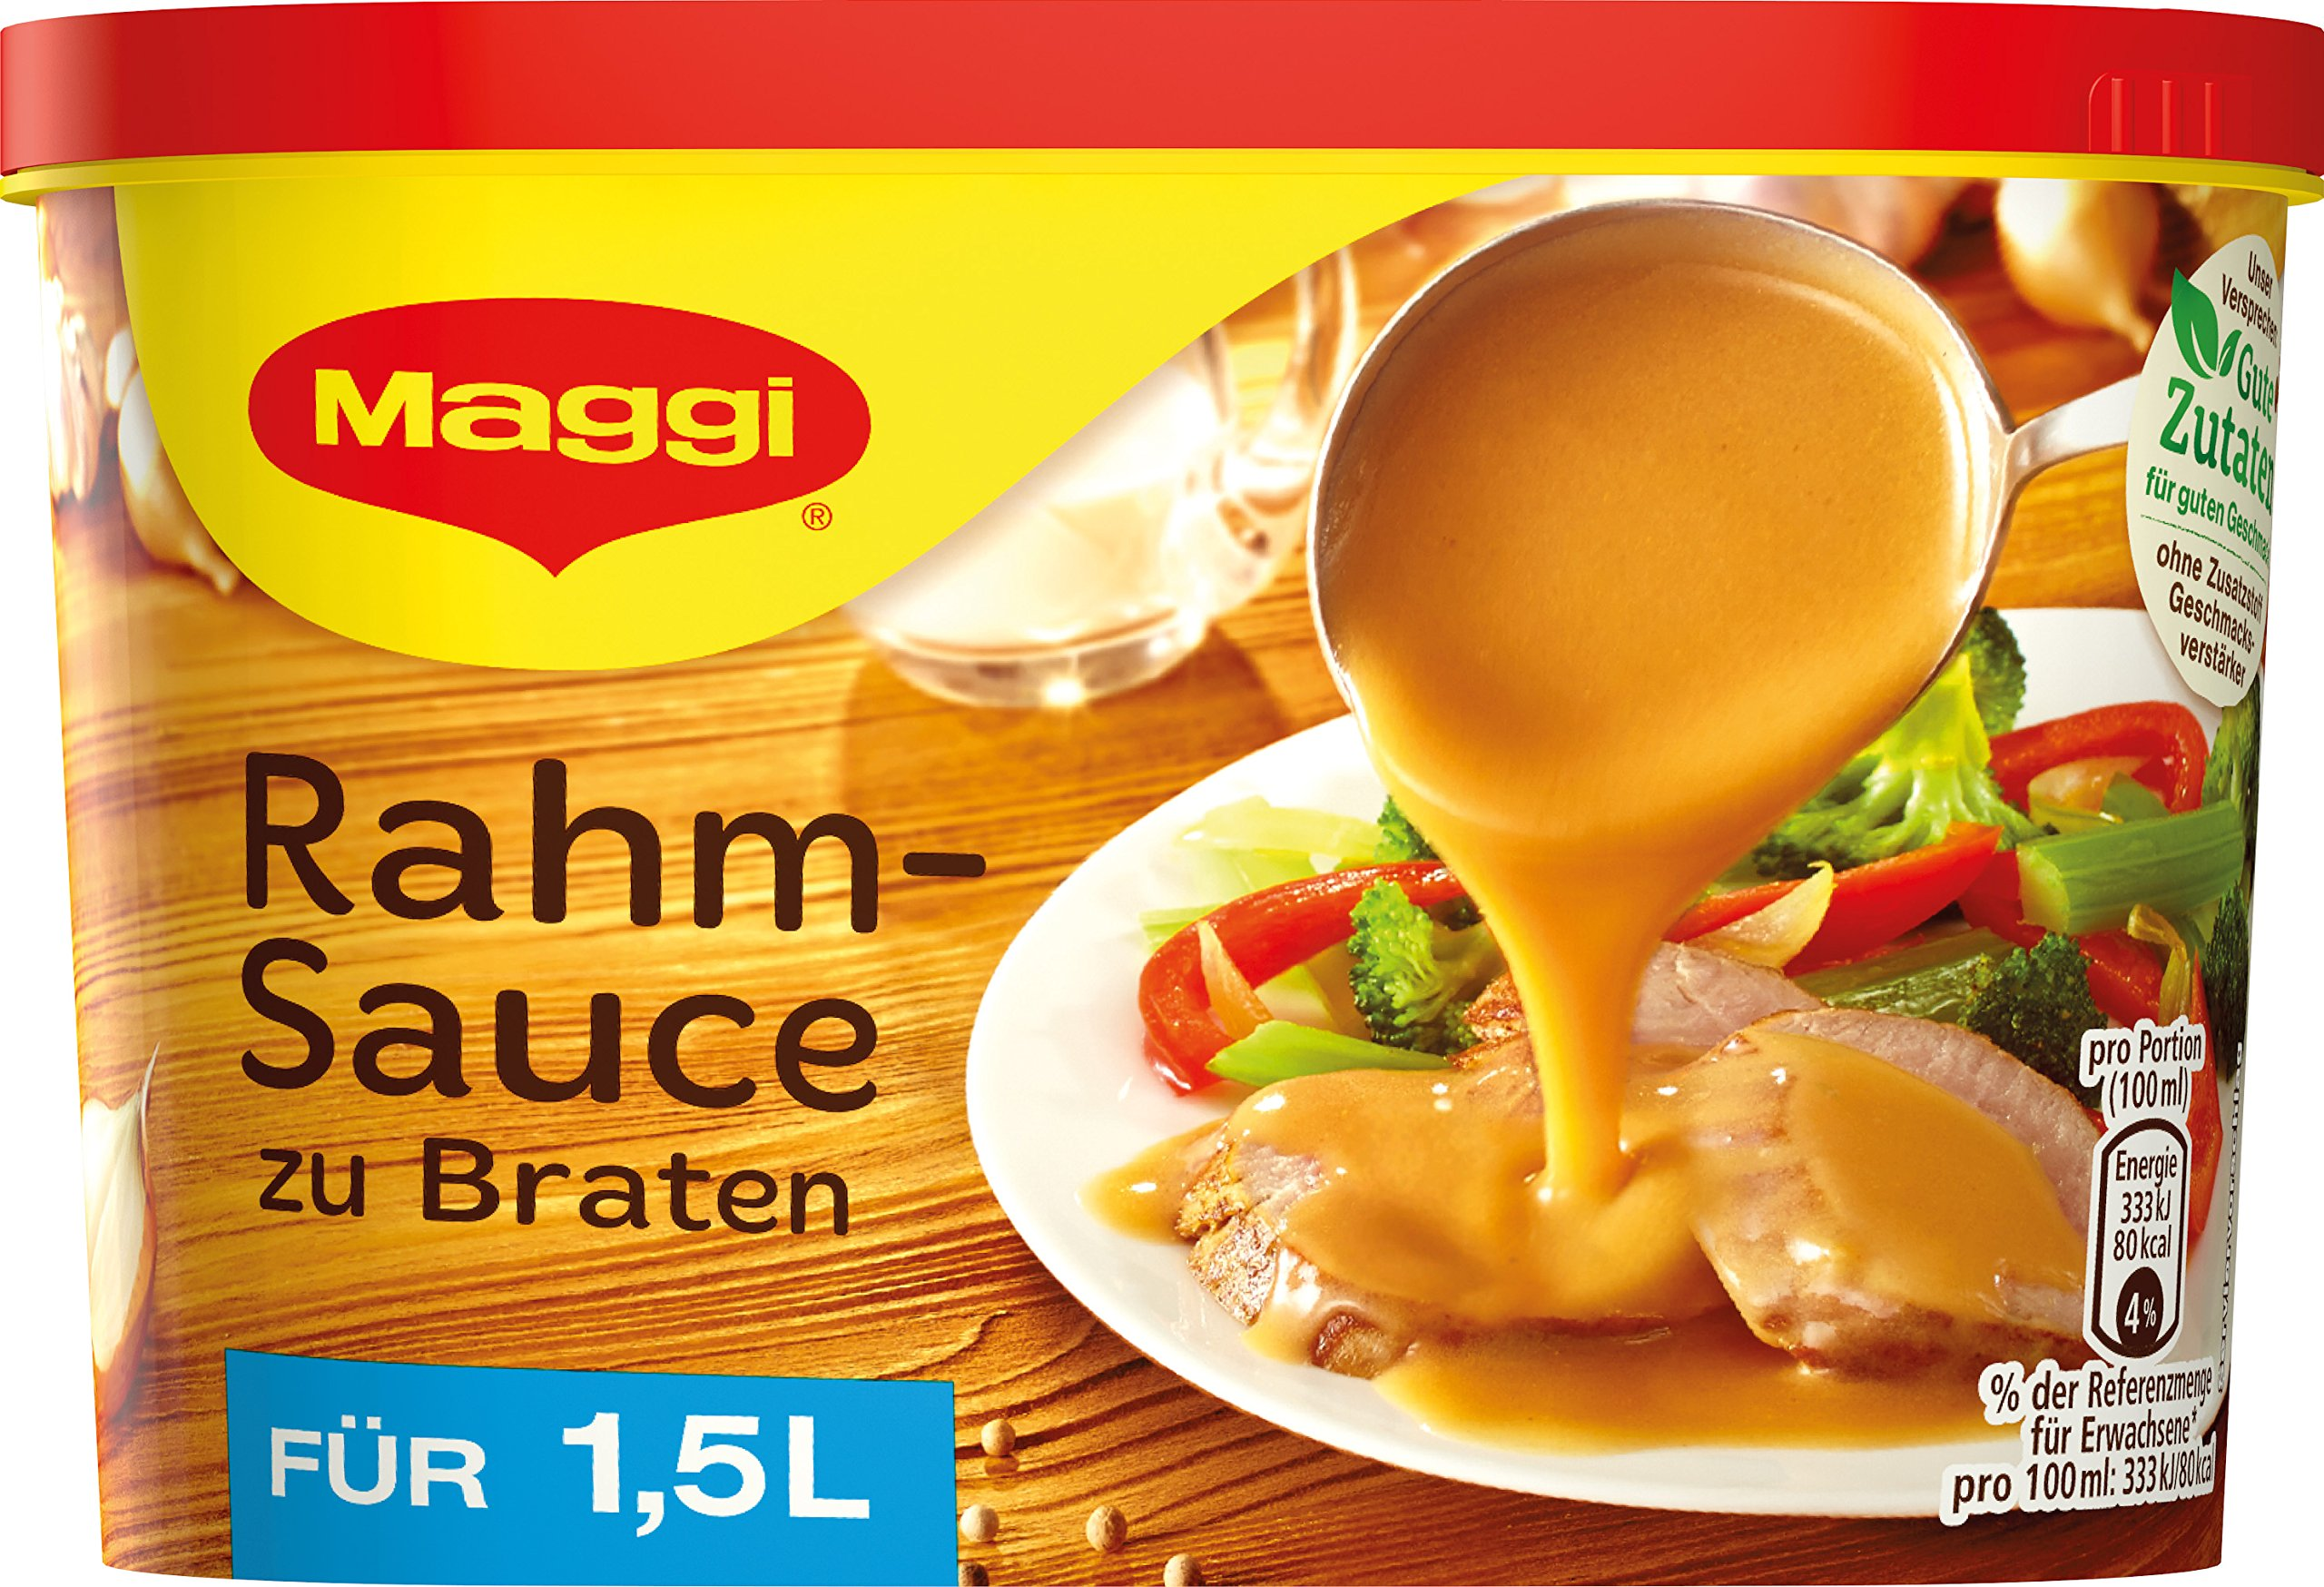 Maggi Creamy Gravy for Roasts ( Rahmsosse zu Braten ) - for 1.5 L